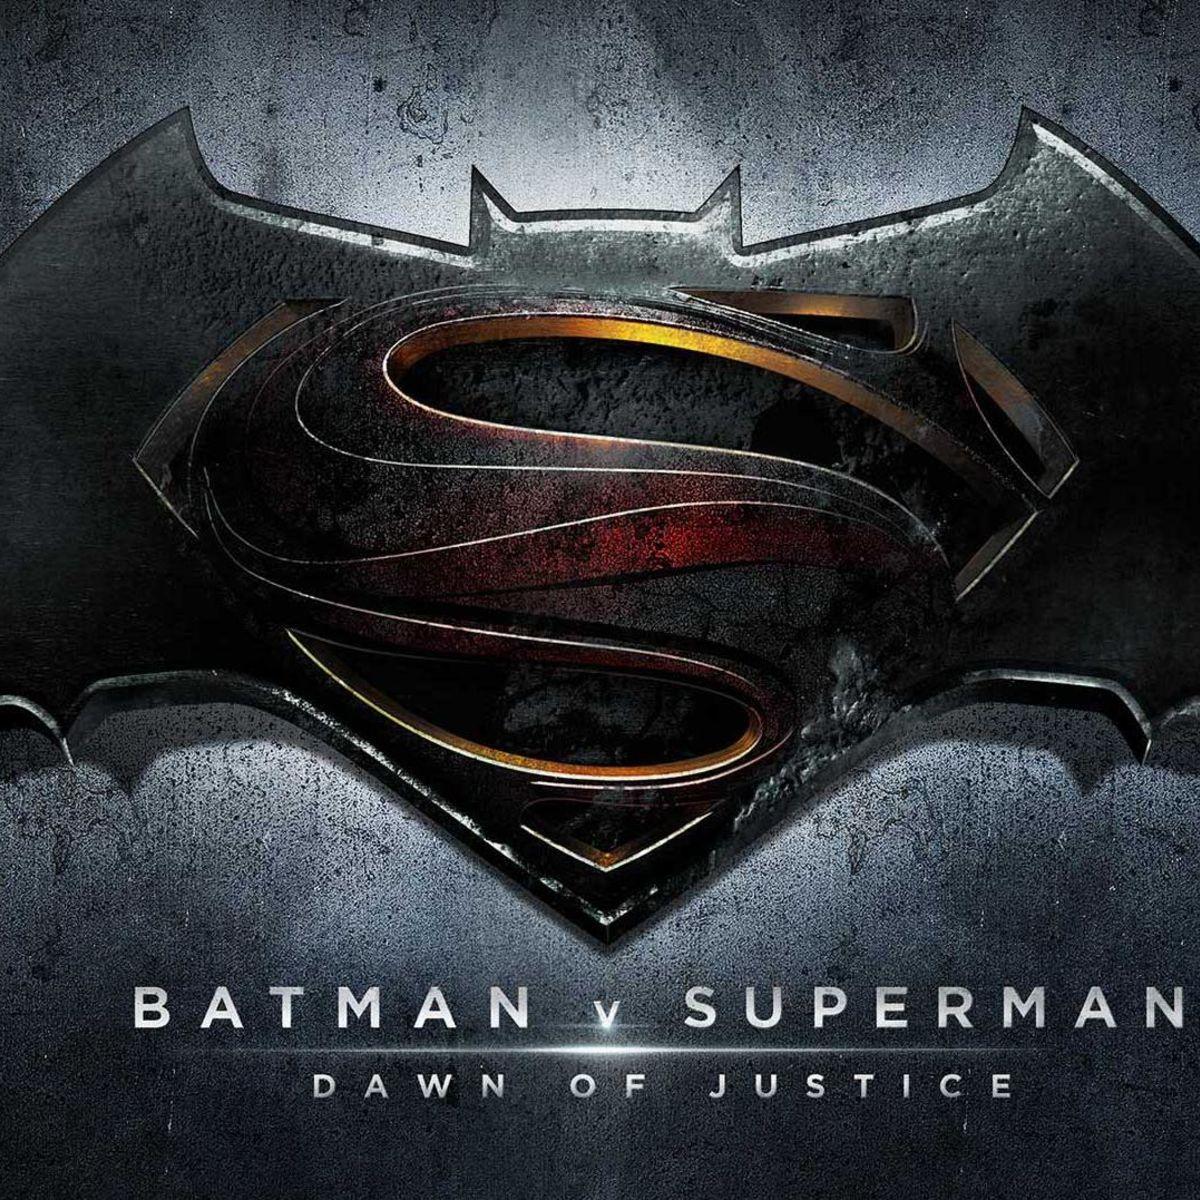 batman-v-superman_dawn-of-justice_official-logo.jpg